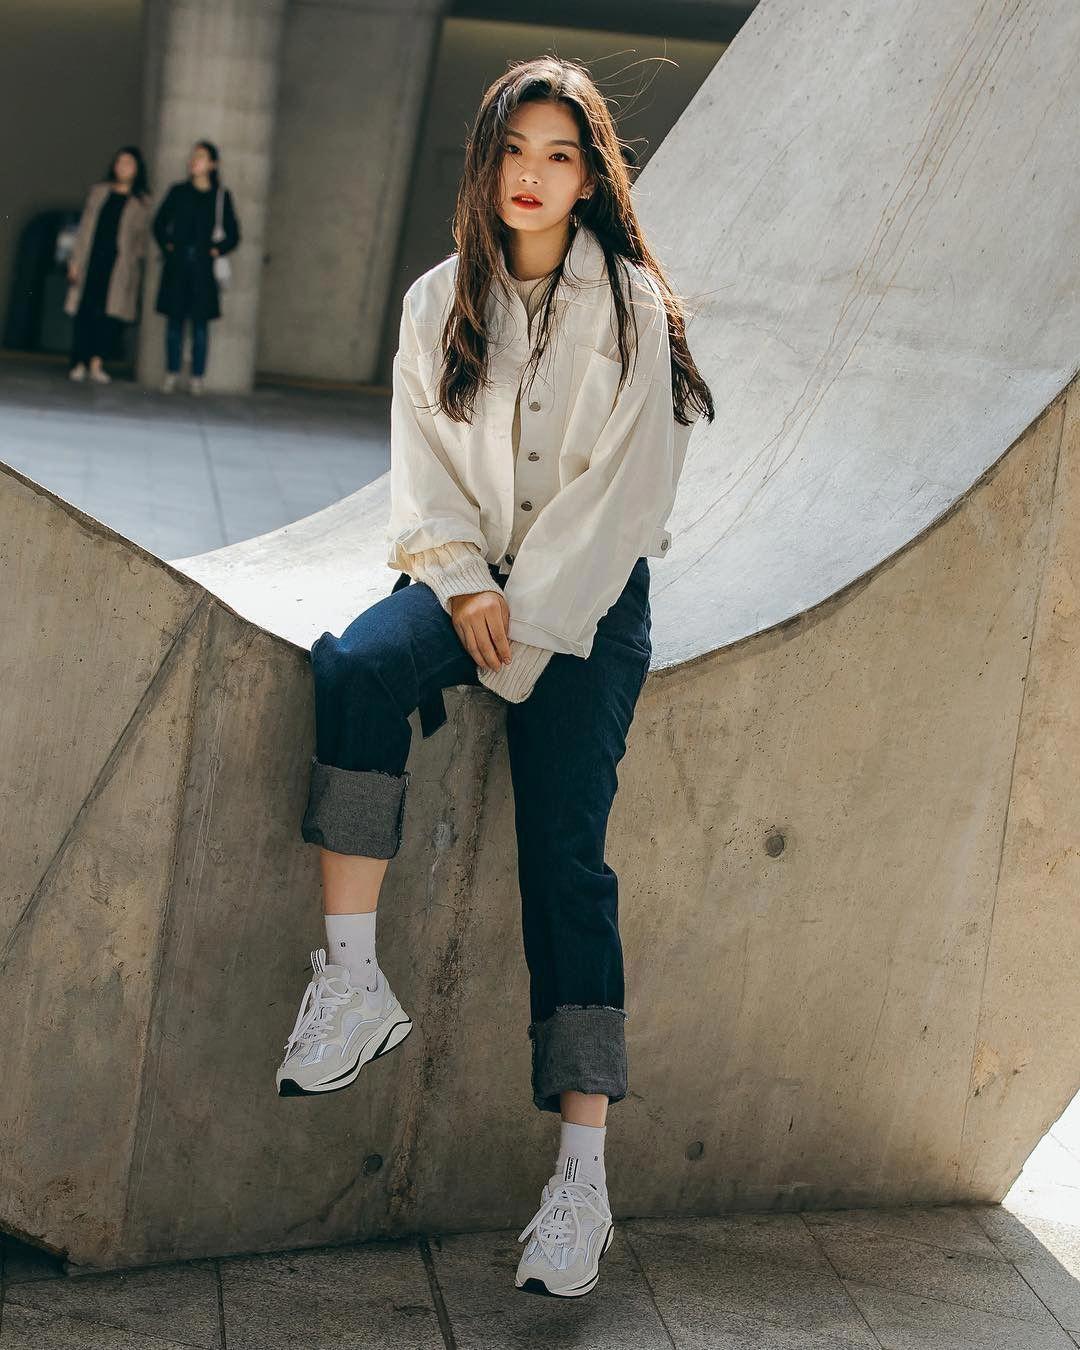 spring korean fashion 26 #springkoreanfashion  Fashion